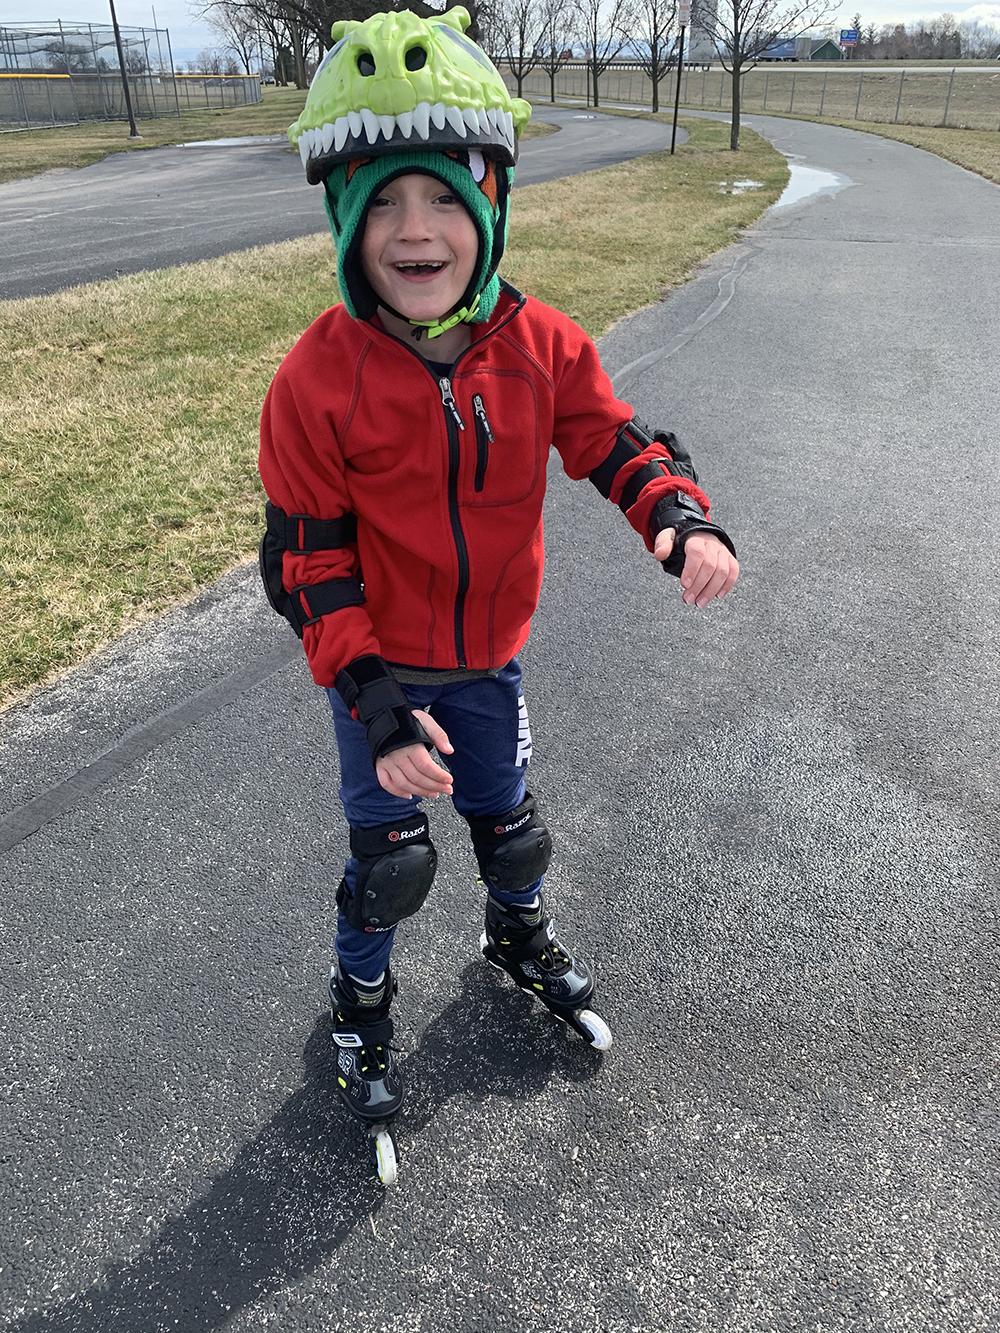 boy in rollerblades